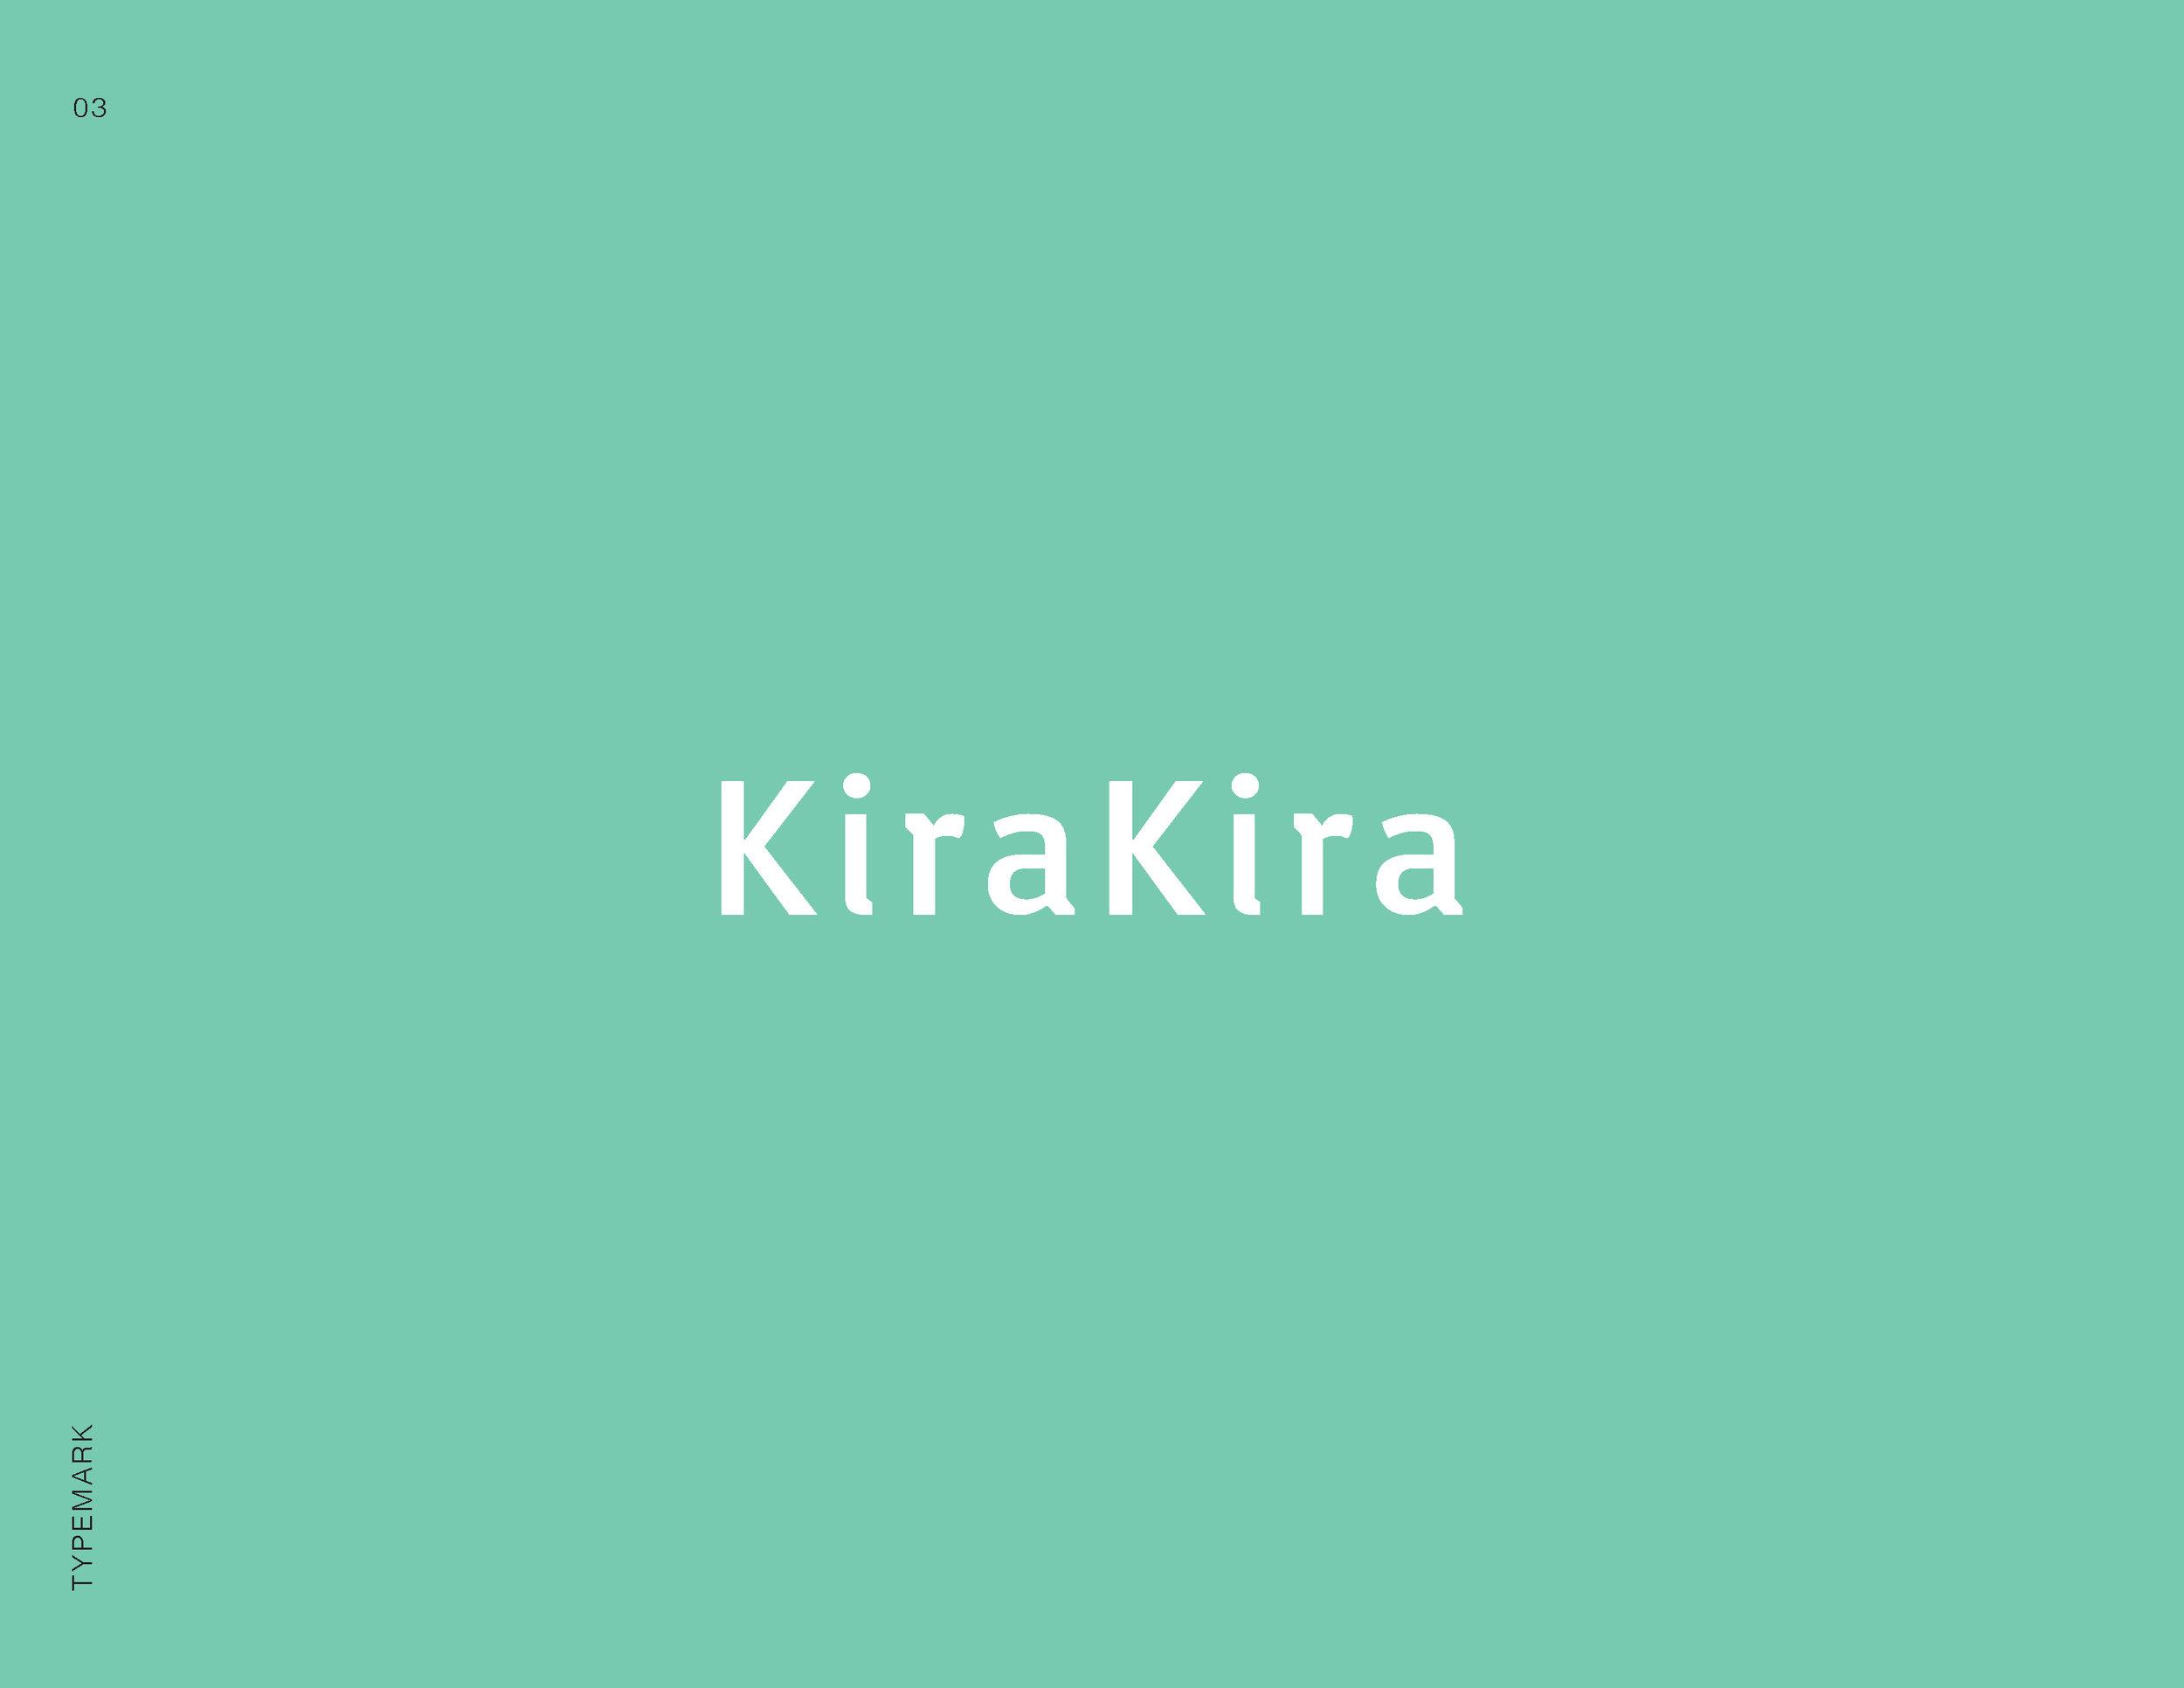 kirakira-brand-guide_Page_03.jpg